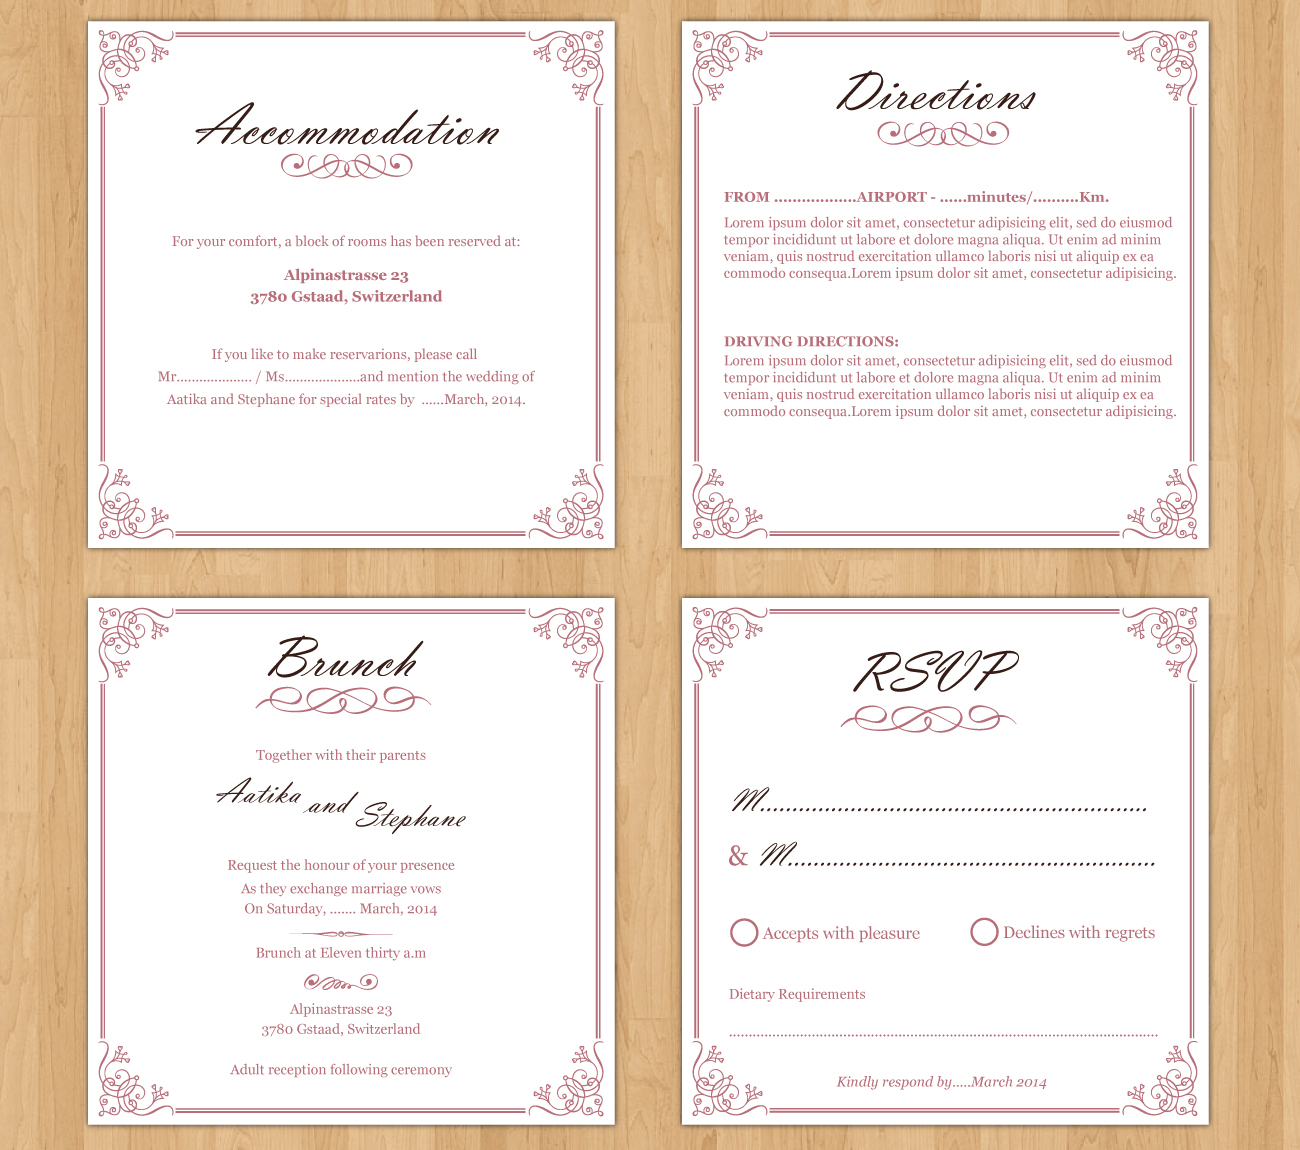 Personable feminine wedding invitation design for a company by invitation design by parul for this project design 3332775 stopboris Choice Image